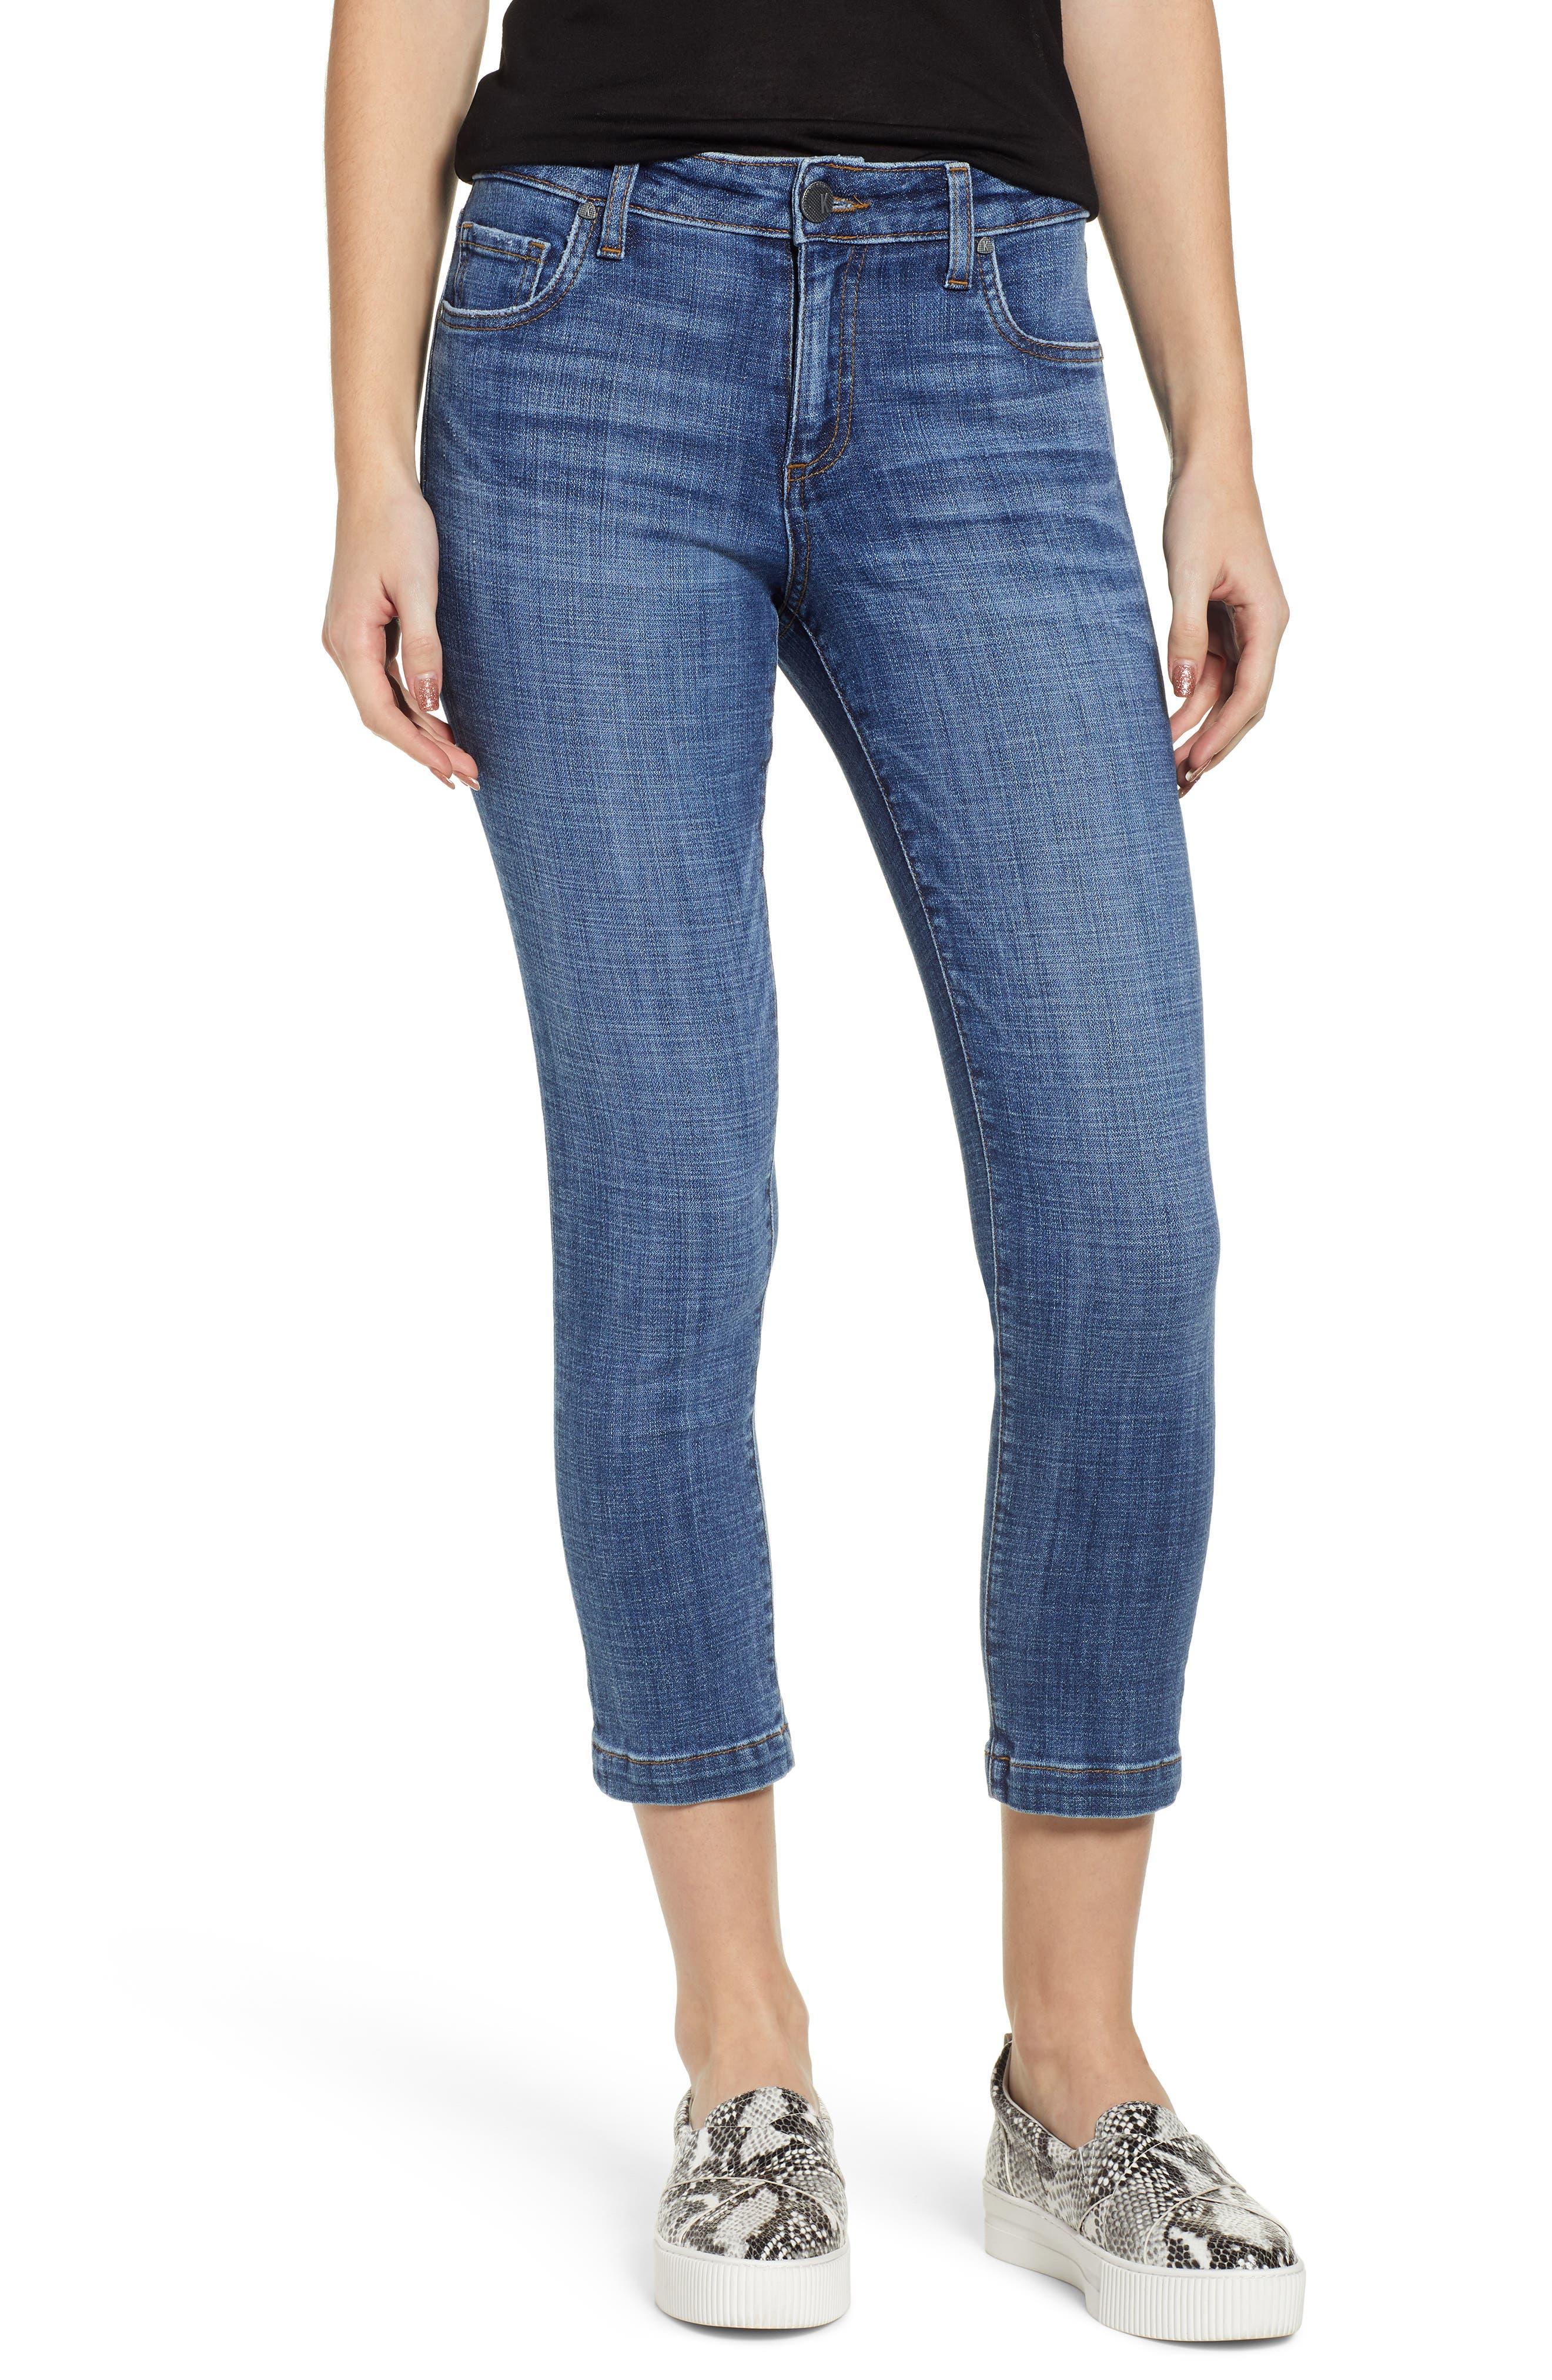 Petite Kut From The Kloth Lauren Crop Jeans, Blue